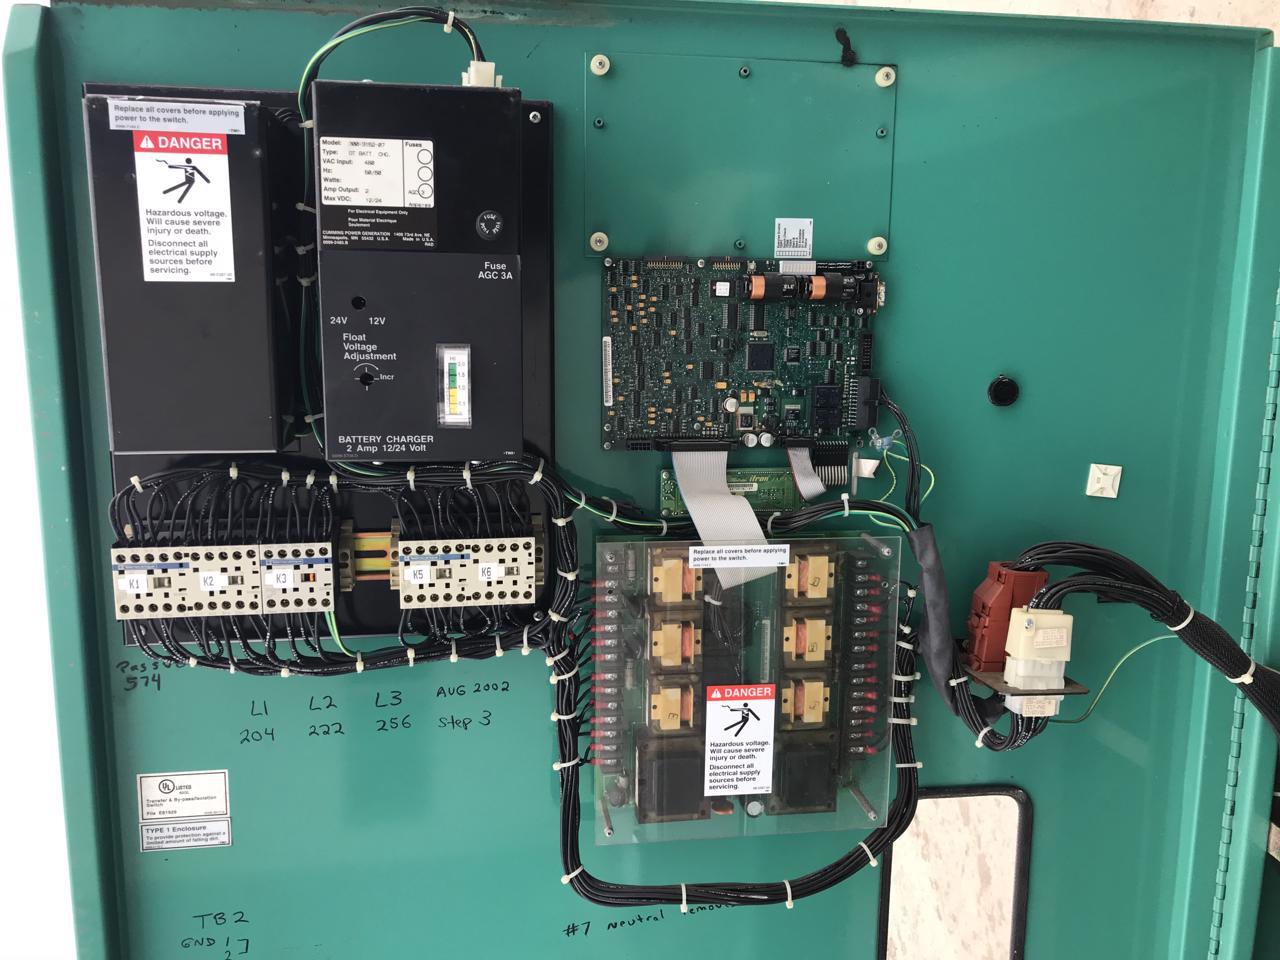 Amp cummins onan transfer switch volts poles type jpg 1280x960 Onan  transfer switch 40 amp